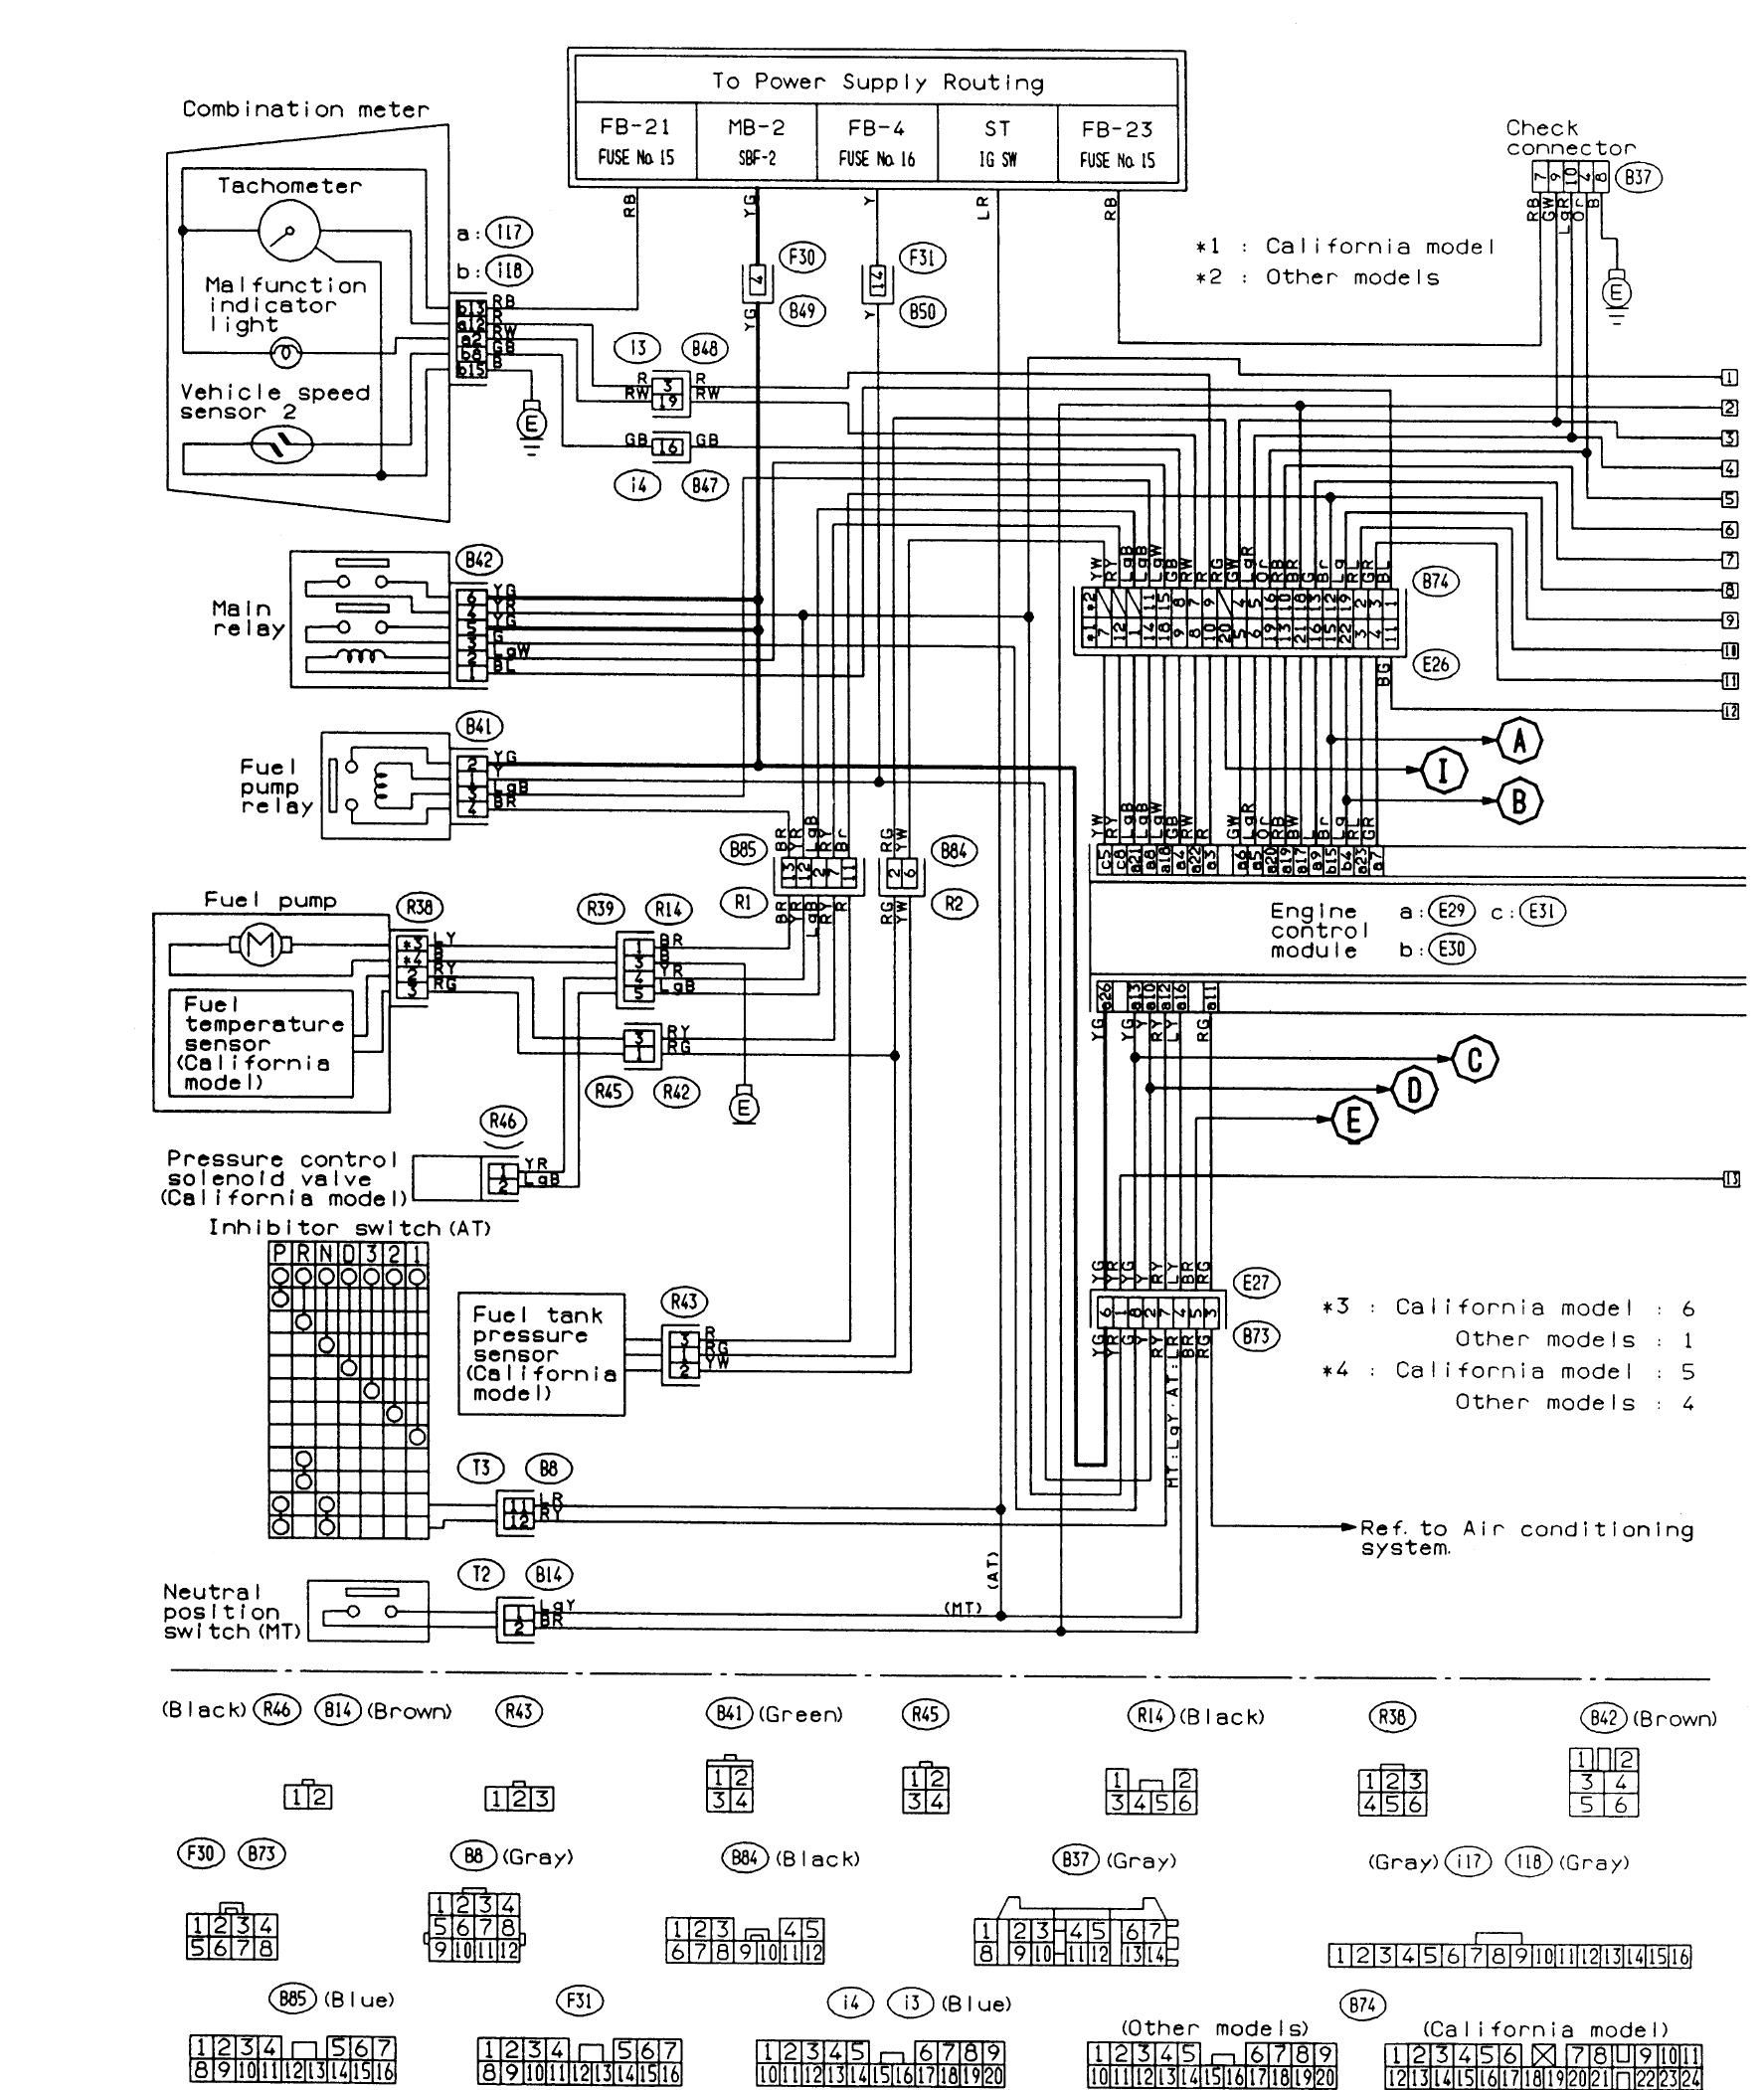 2004 Subaru Legacy Stereo Wiring Diagram